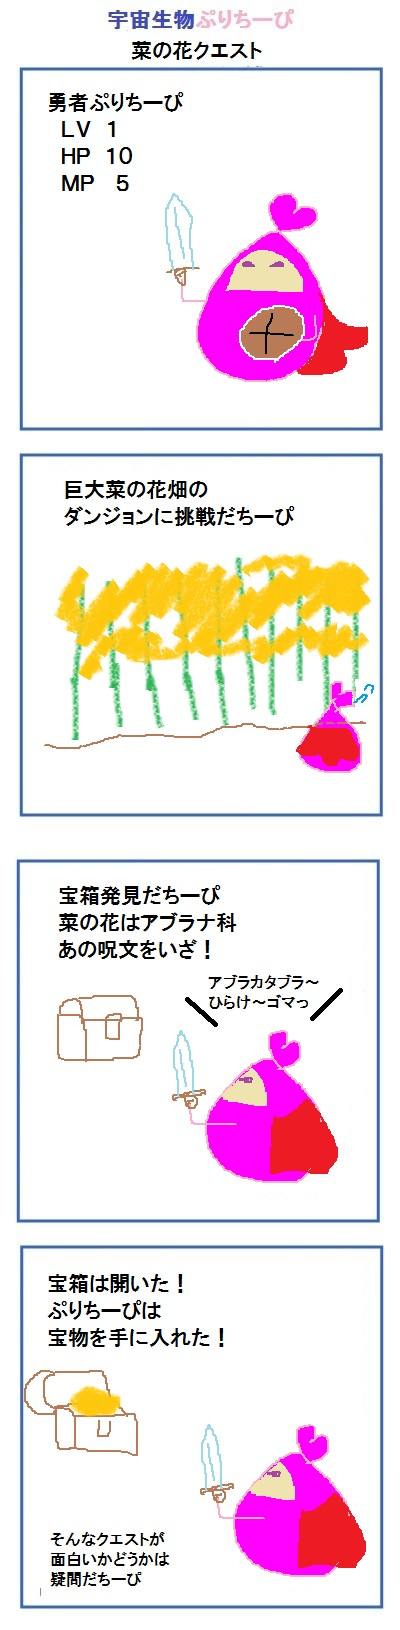 160314_nanohana_quest.jpg